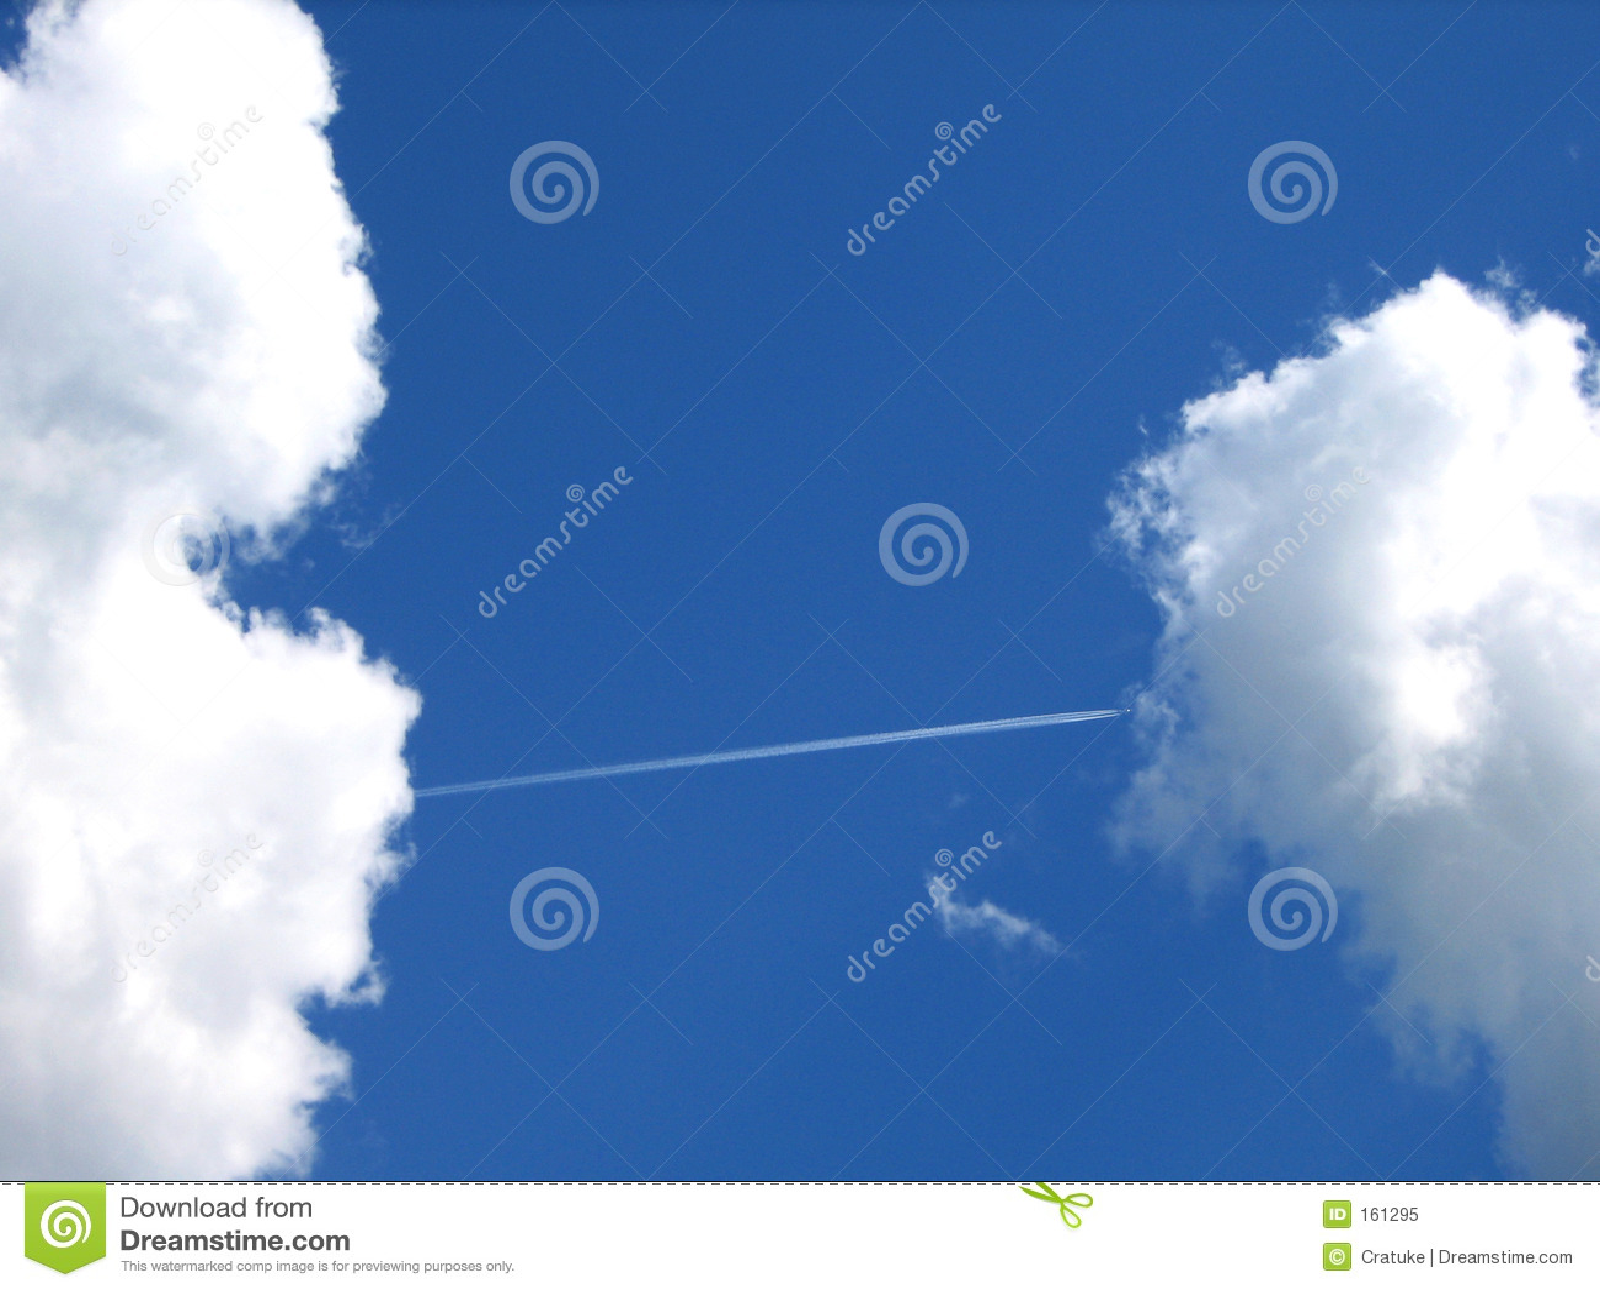 Download Airway-like A Bridge Between Clouds Stock Image - Image of mild, airplane: 161295